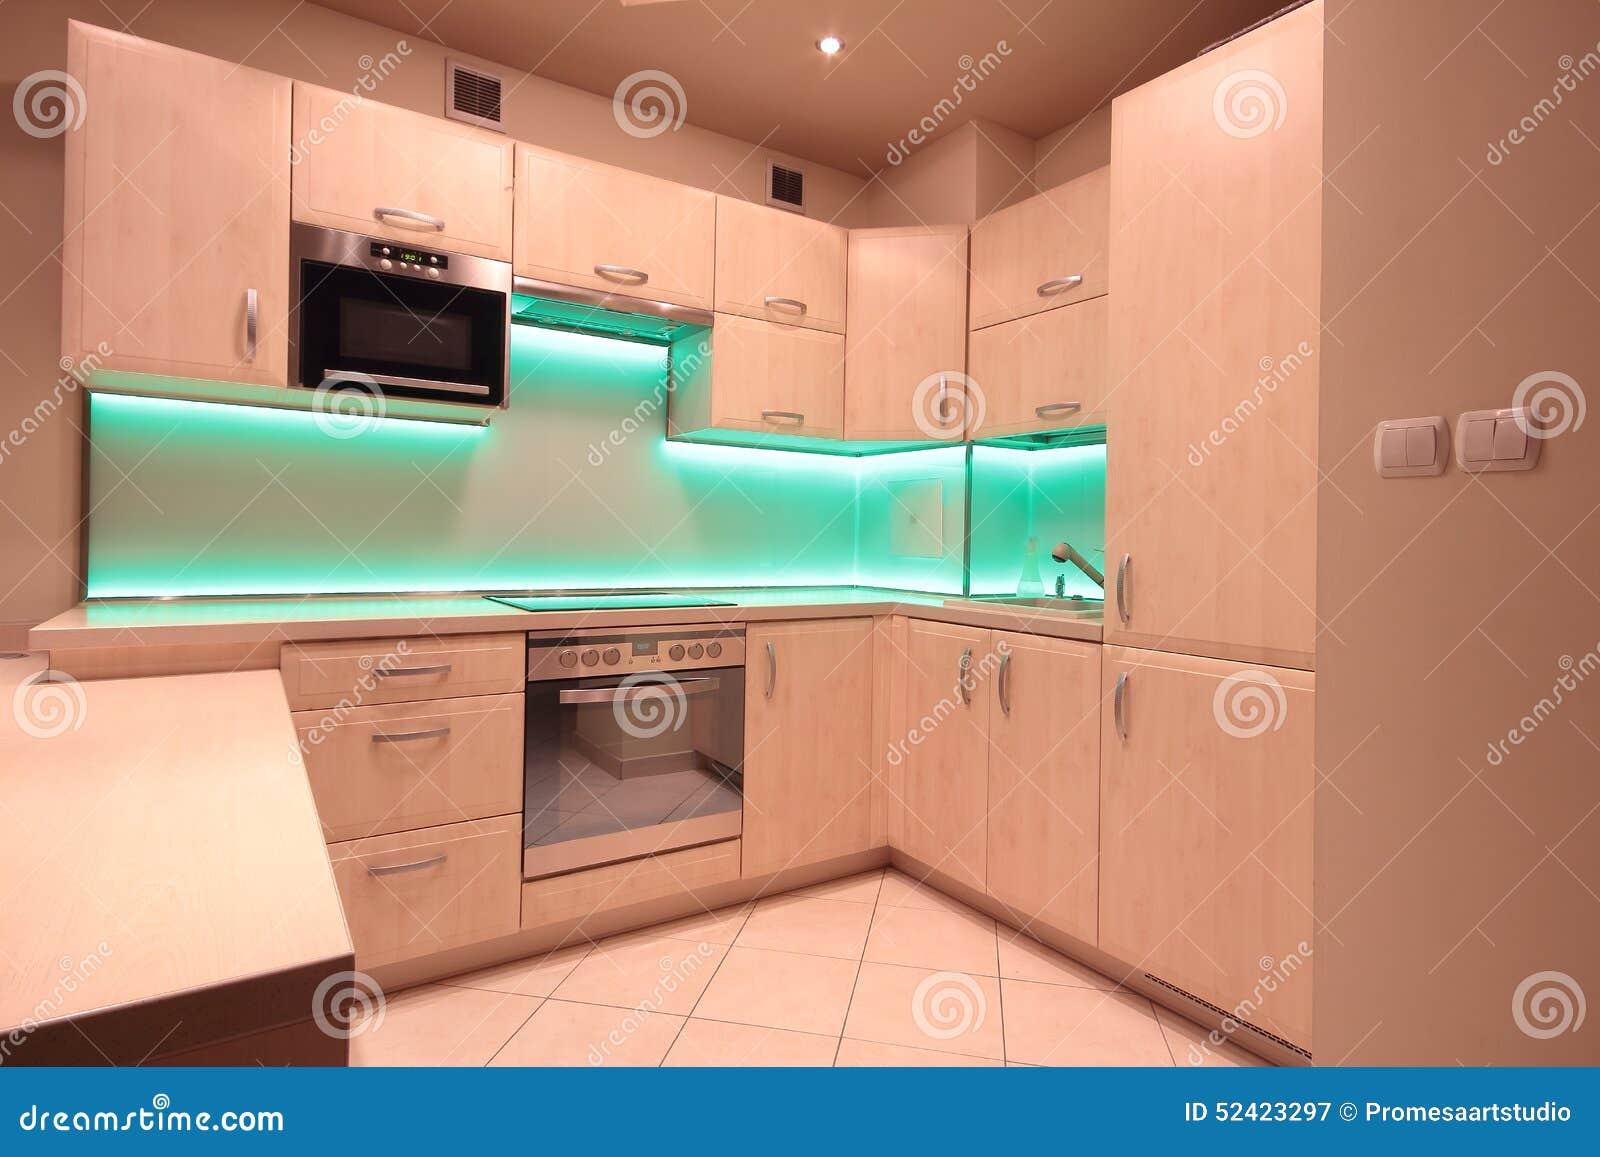 The lighting design studio has worked on many prestigious